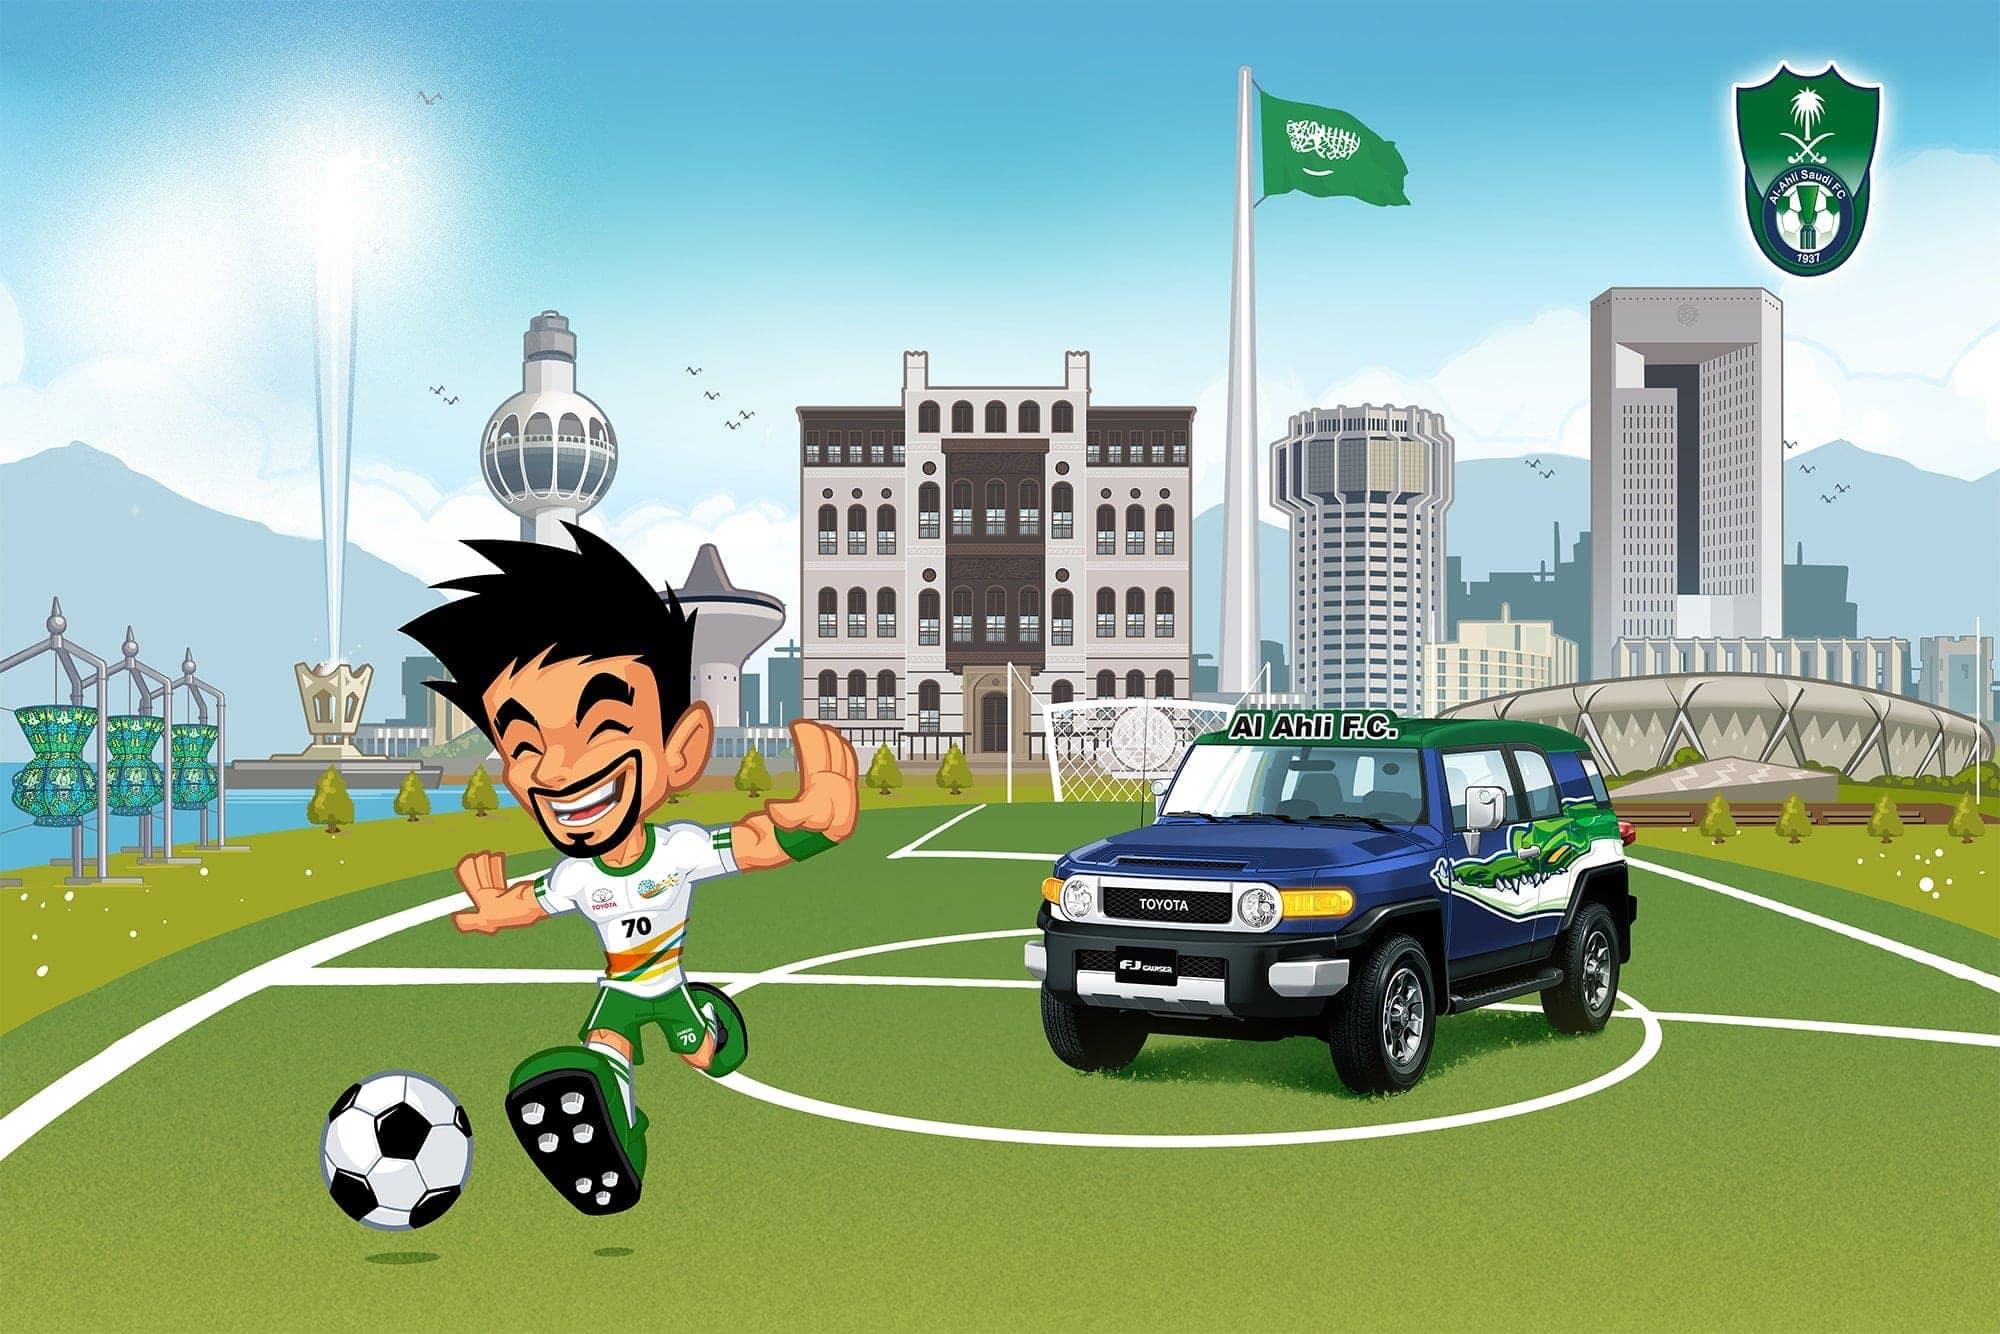 jeddah illustration